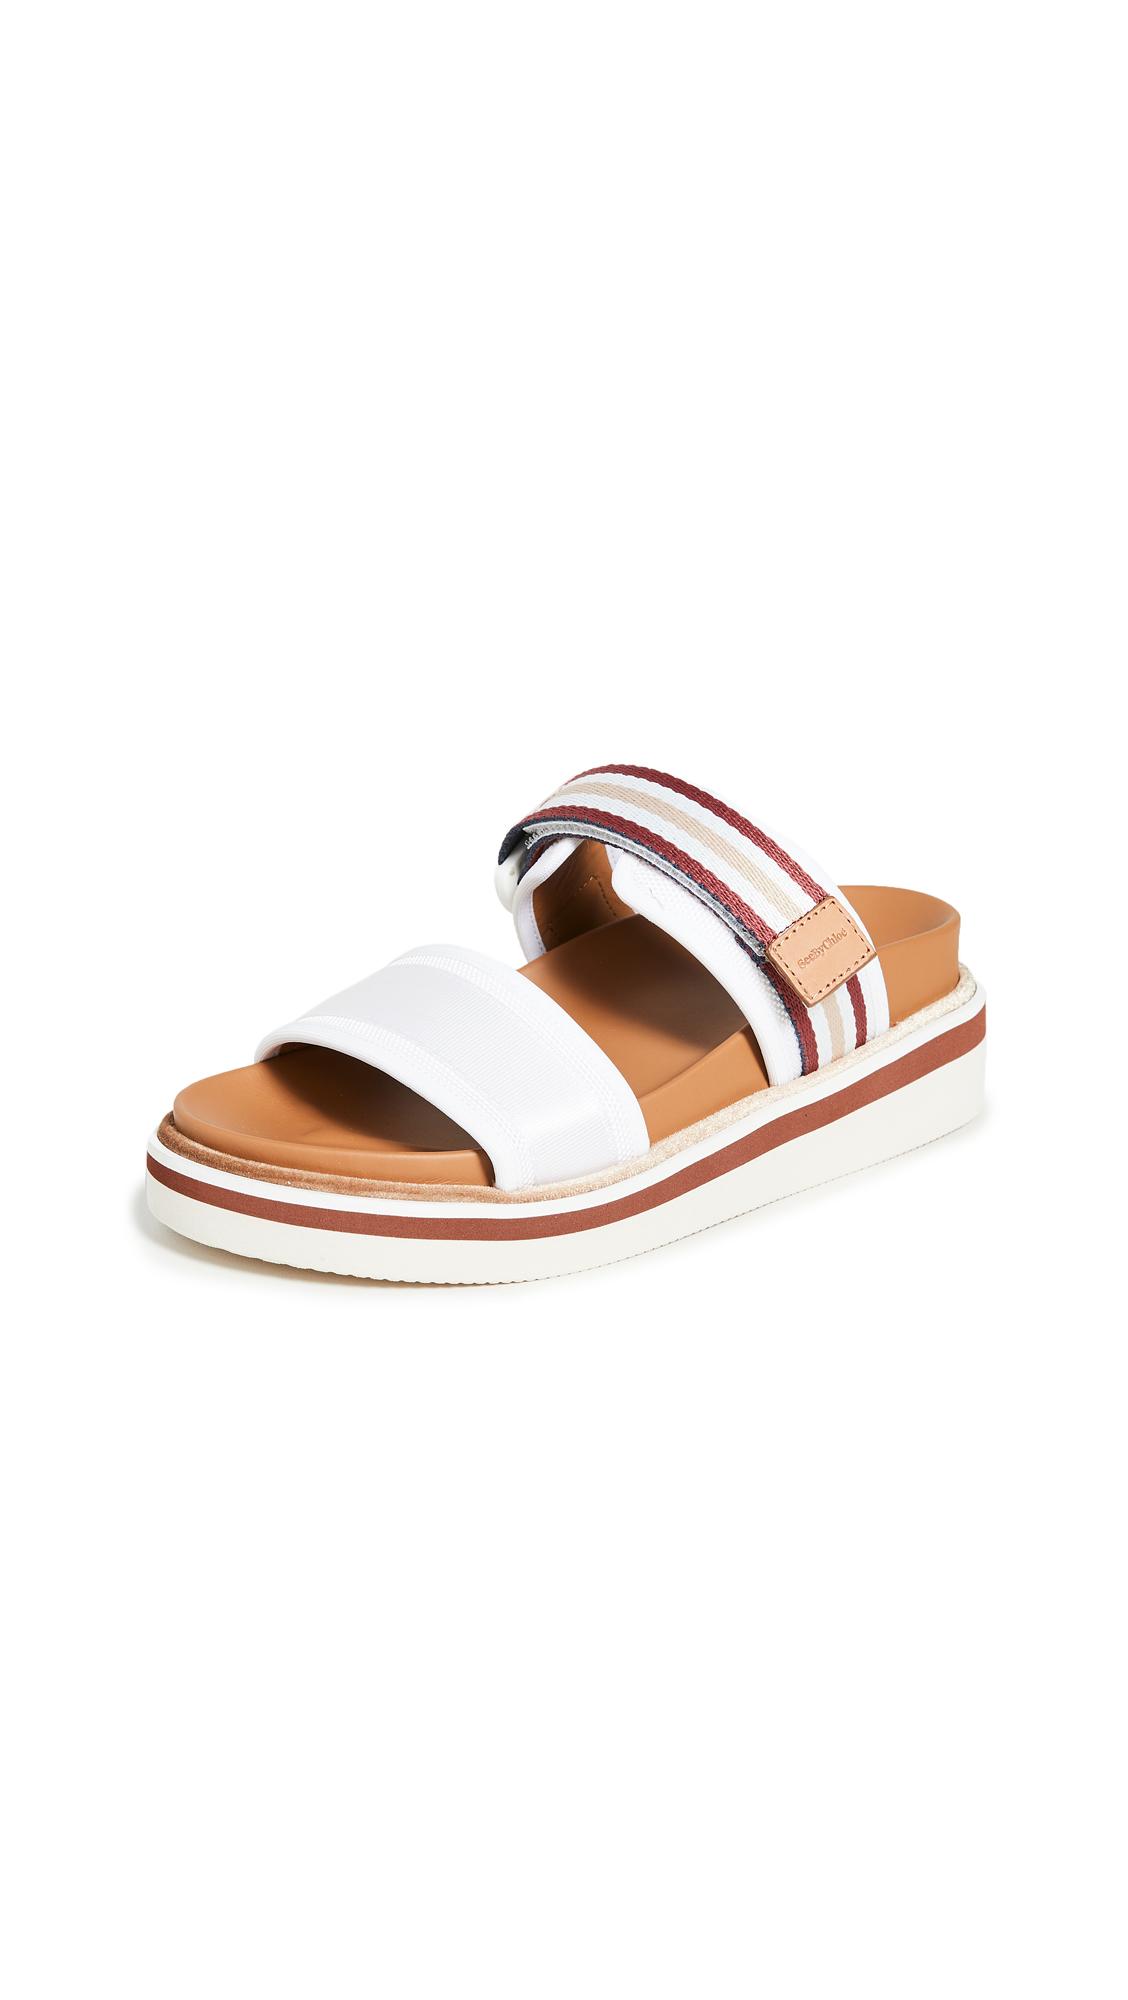 Buy See by Chloe Yumi Sport Sandals online, shop See by Chloe